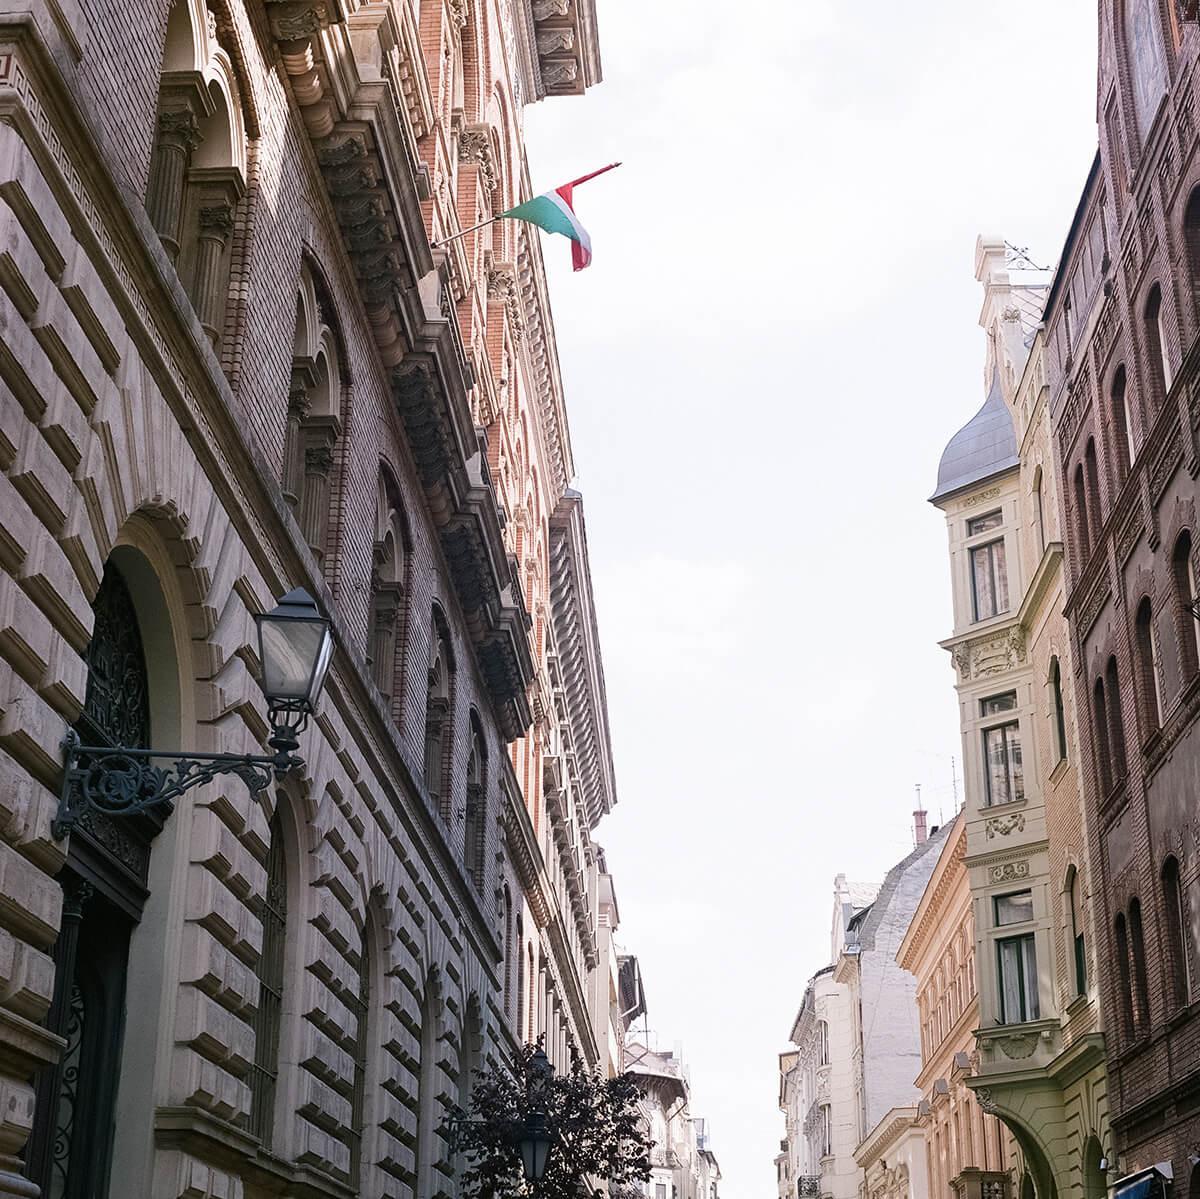 Váci u. Budapest Shopping (c) Lomoherz